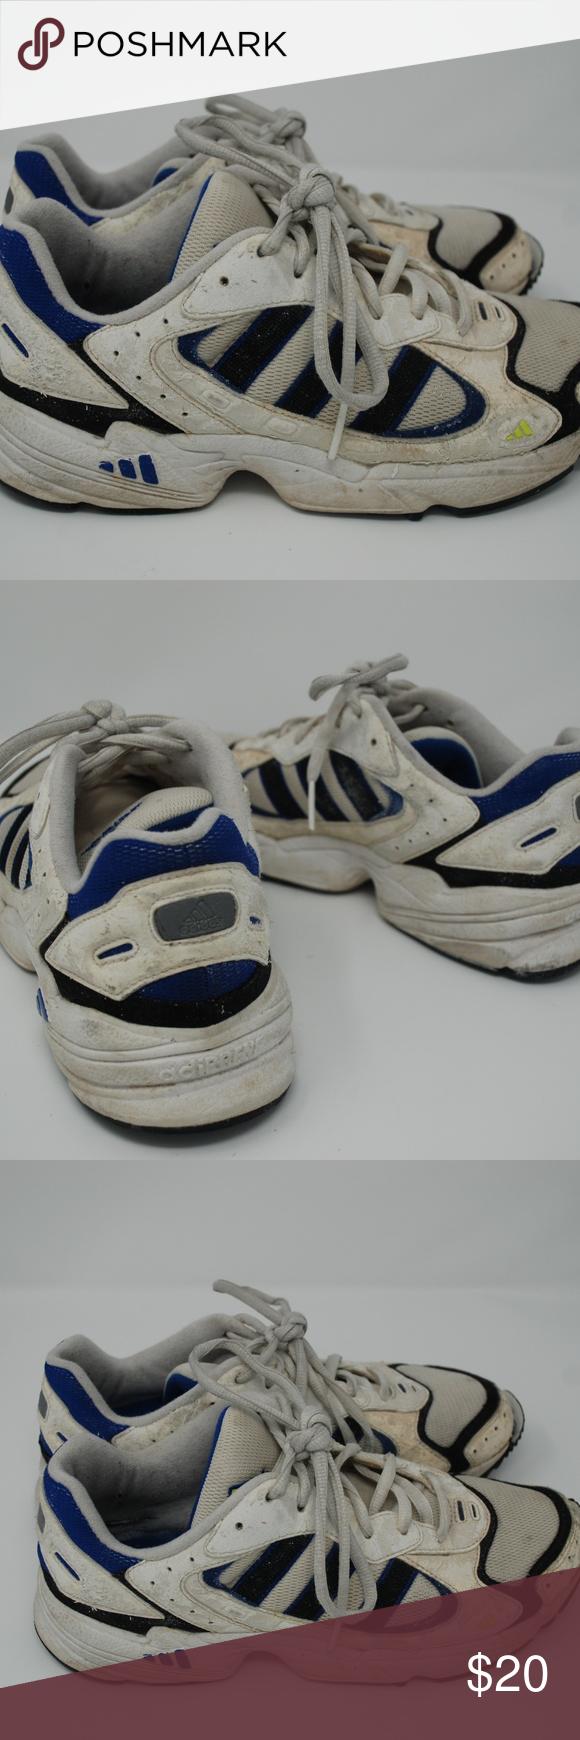 cb443ae52ab48 Vintage 90s Adidas Adiprene Chunky Mesh Sneakers Blue